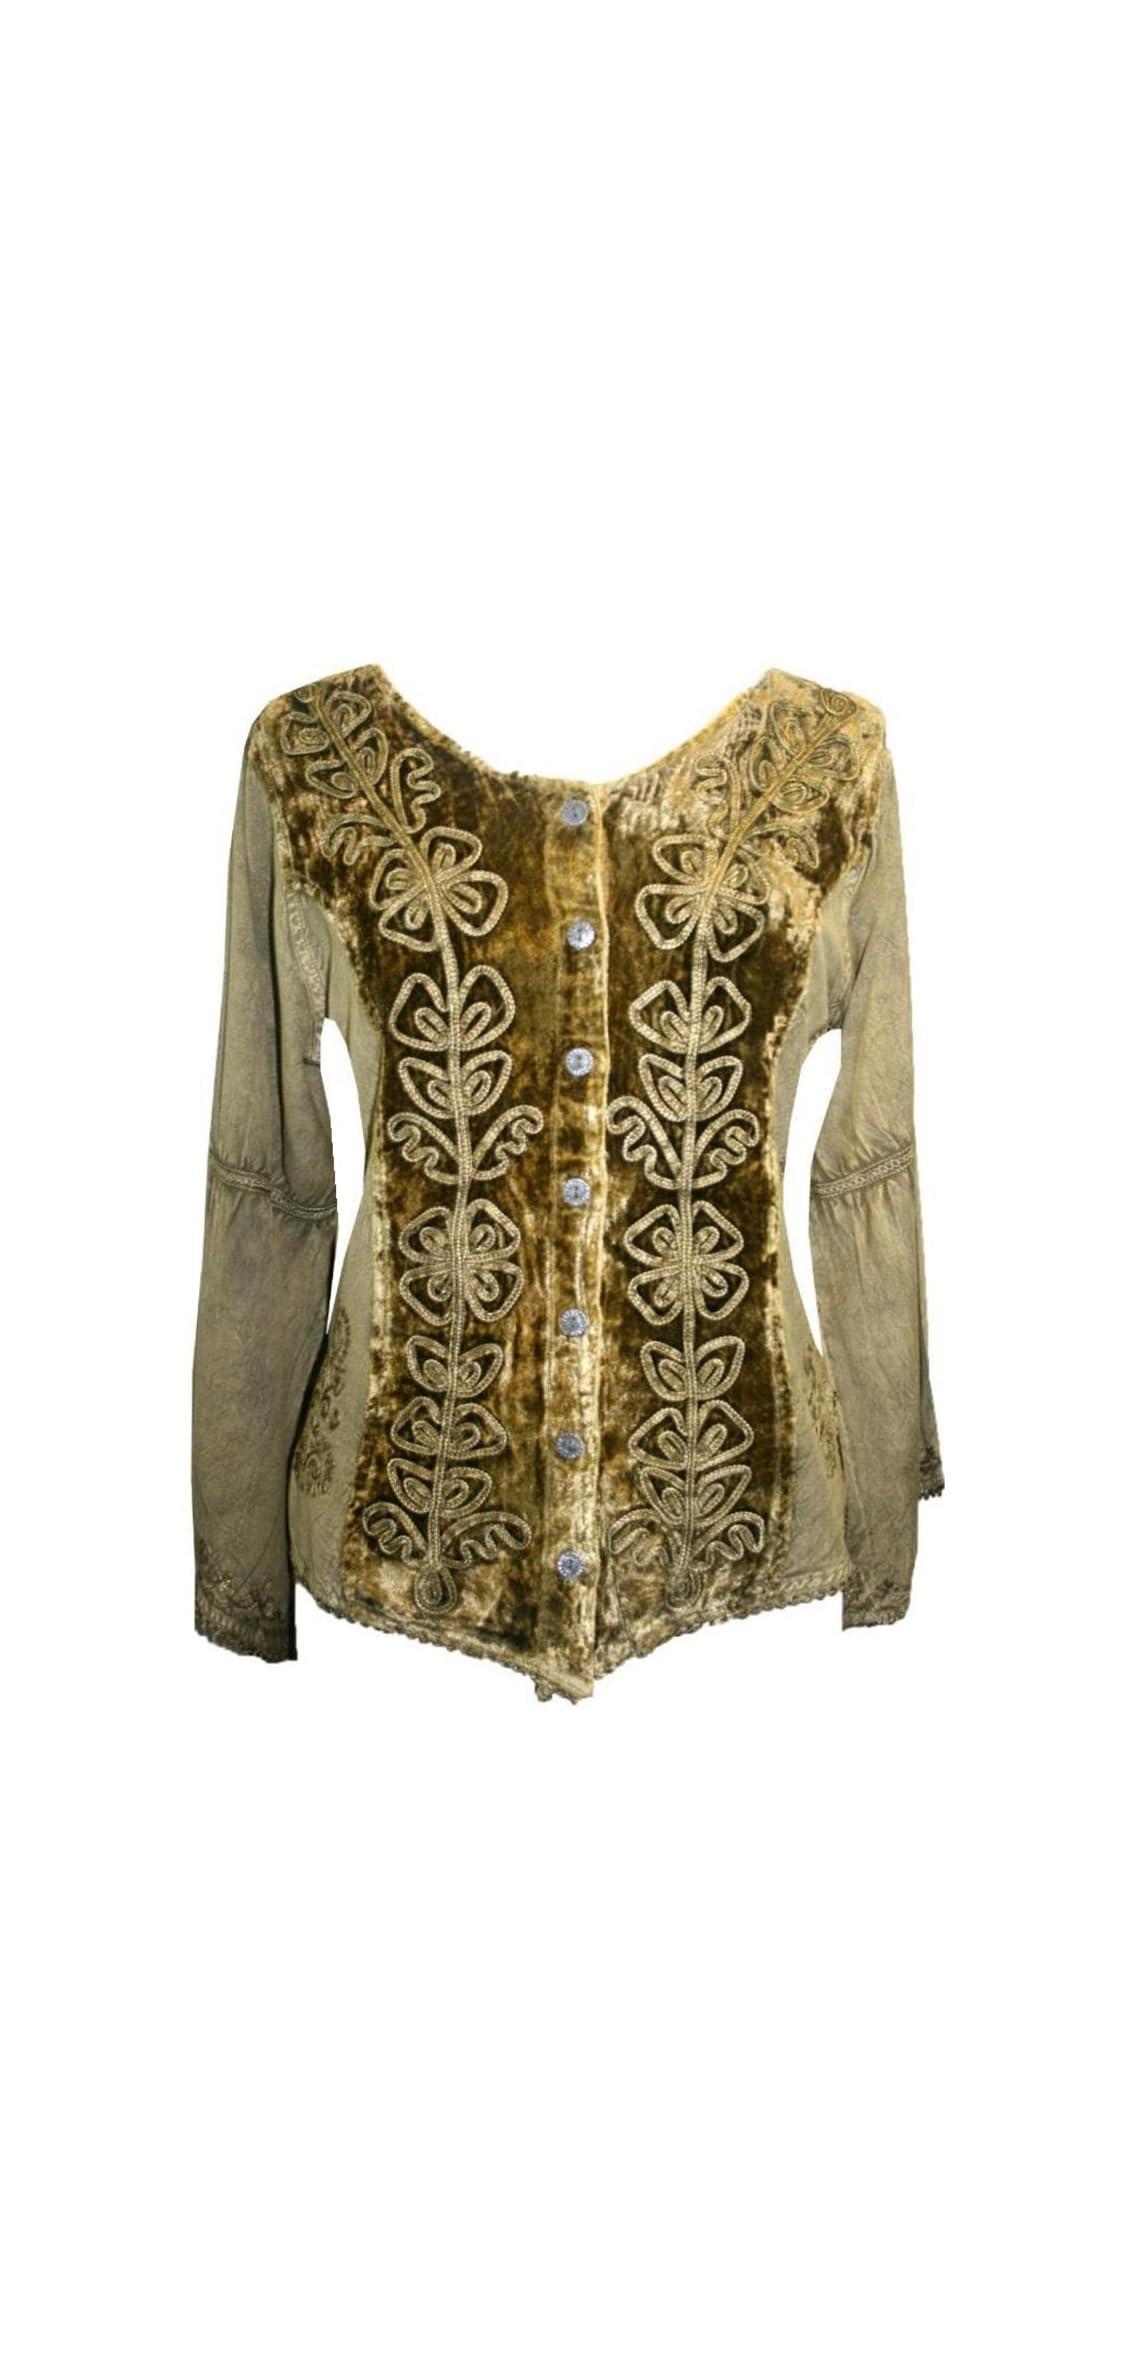 B Womens Renaissance Vintage Gothic Velvet Button Down Shirt